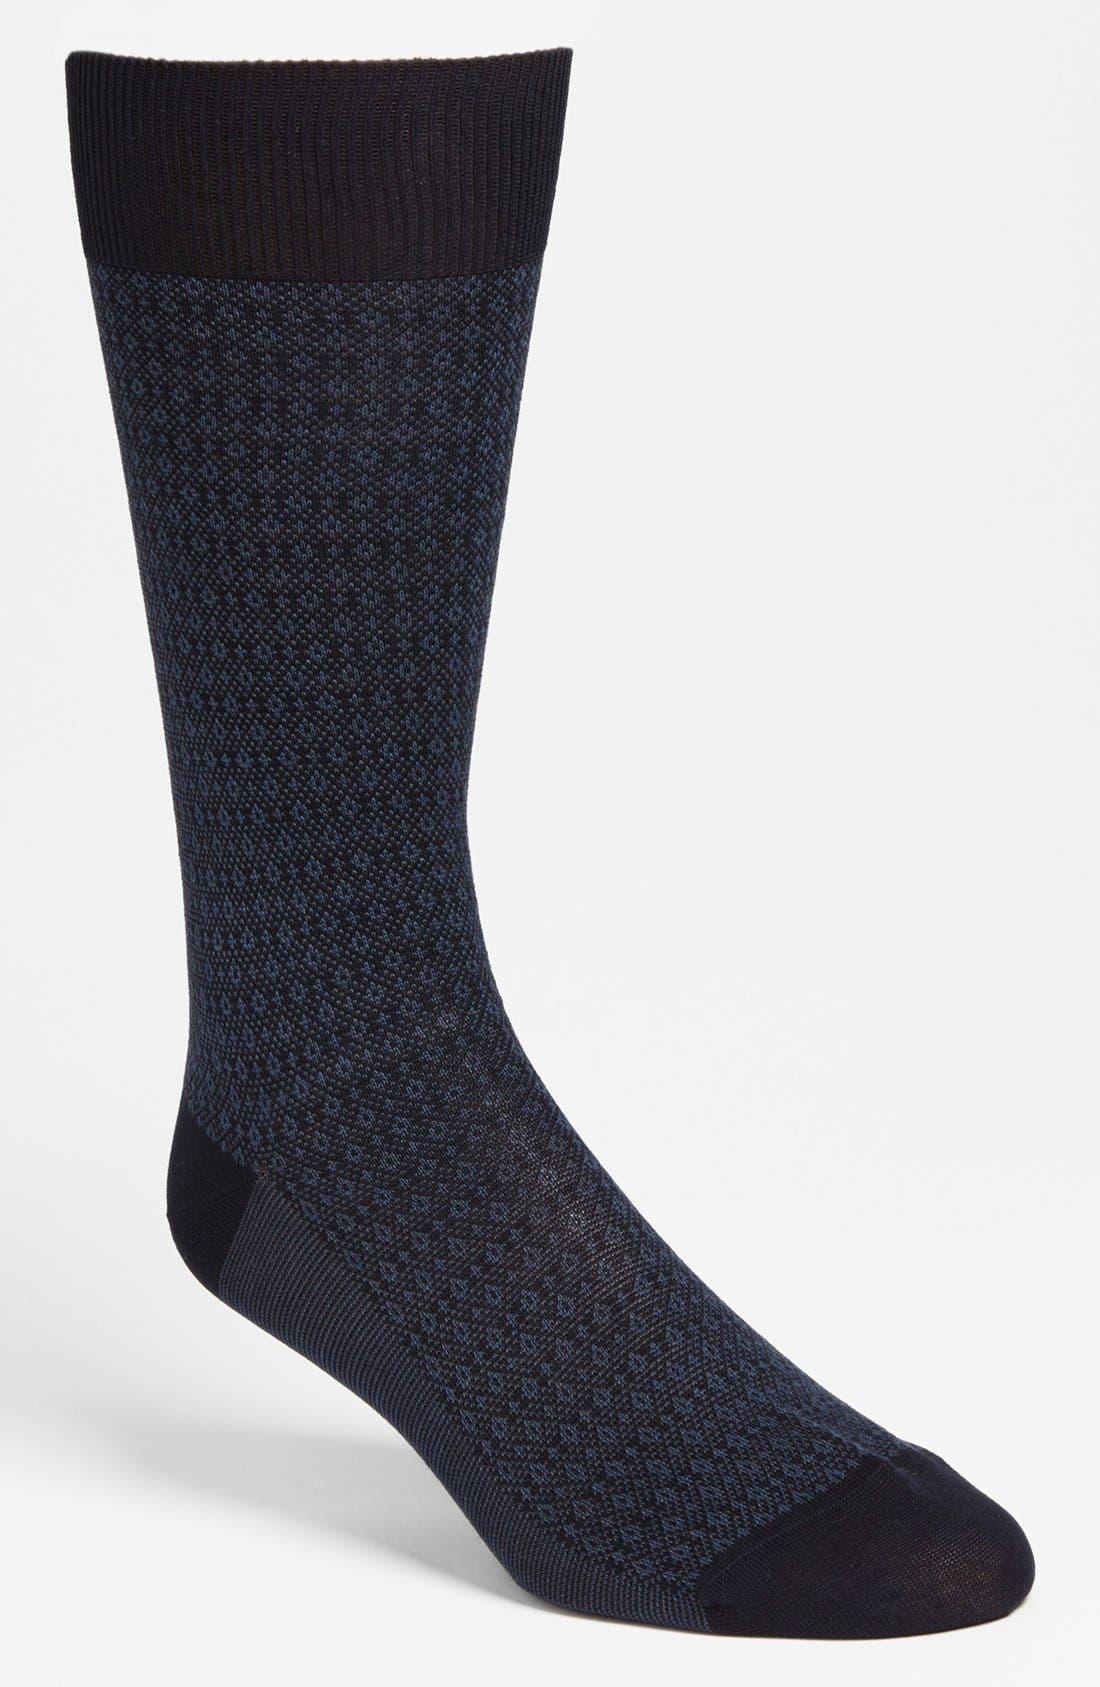 Main Image - Pantherella 'Fenchurch' Birdseye Socks